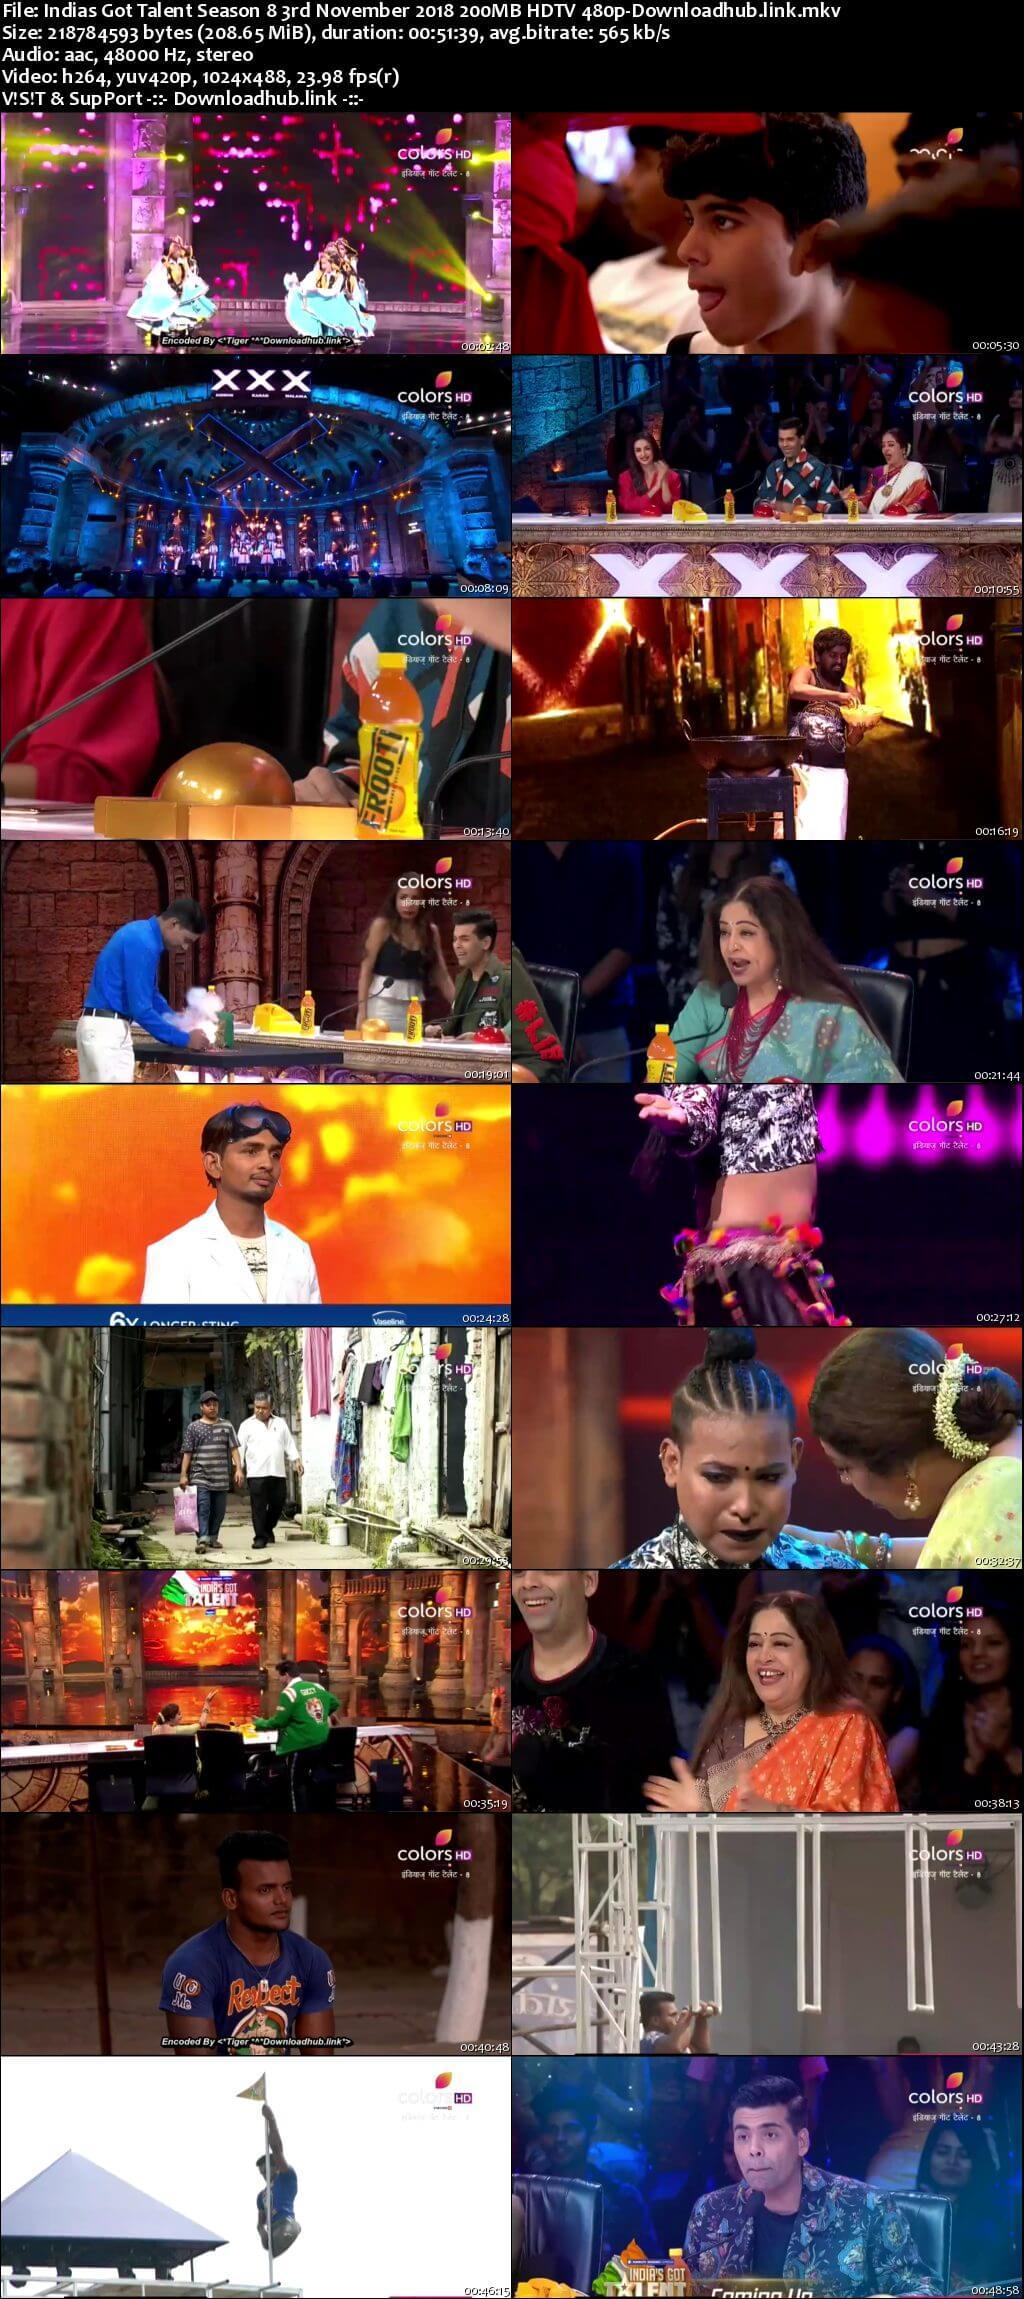 Indias Got Talent Season 8 03 November 2018 Episode 05 HDTV 480p